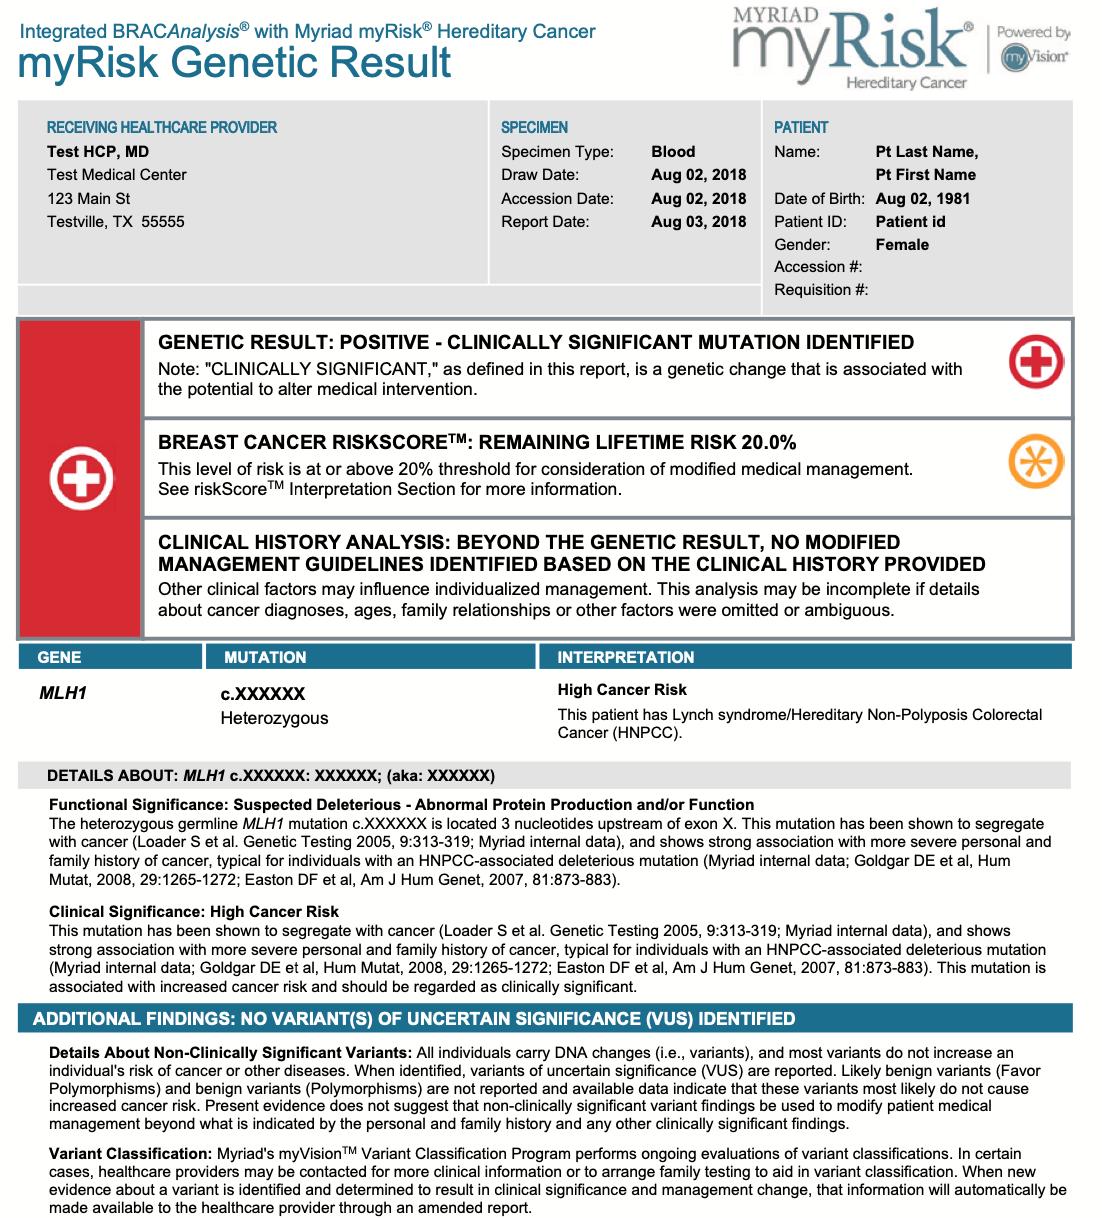 Myriad Genetics myRisk summary